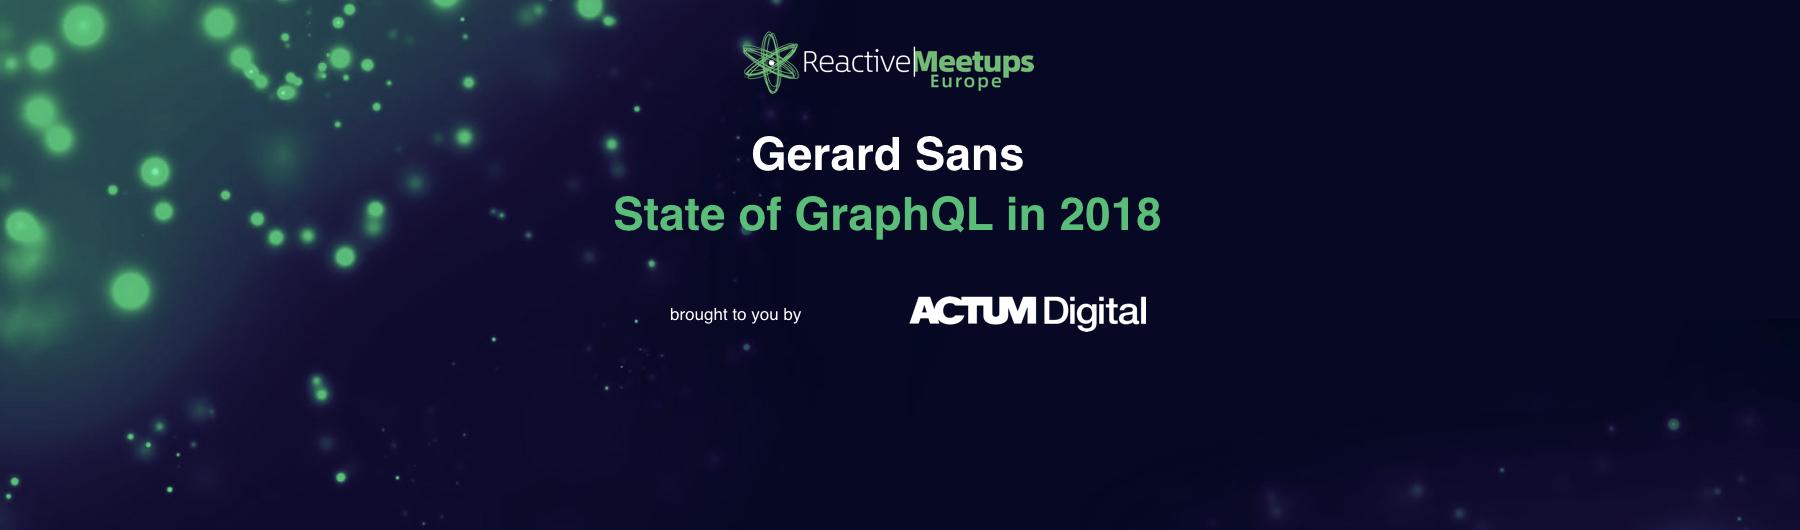 ReactiveMeetups Prague   Gerard Sans